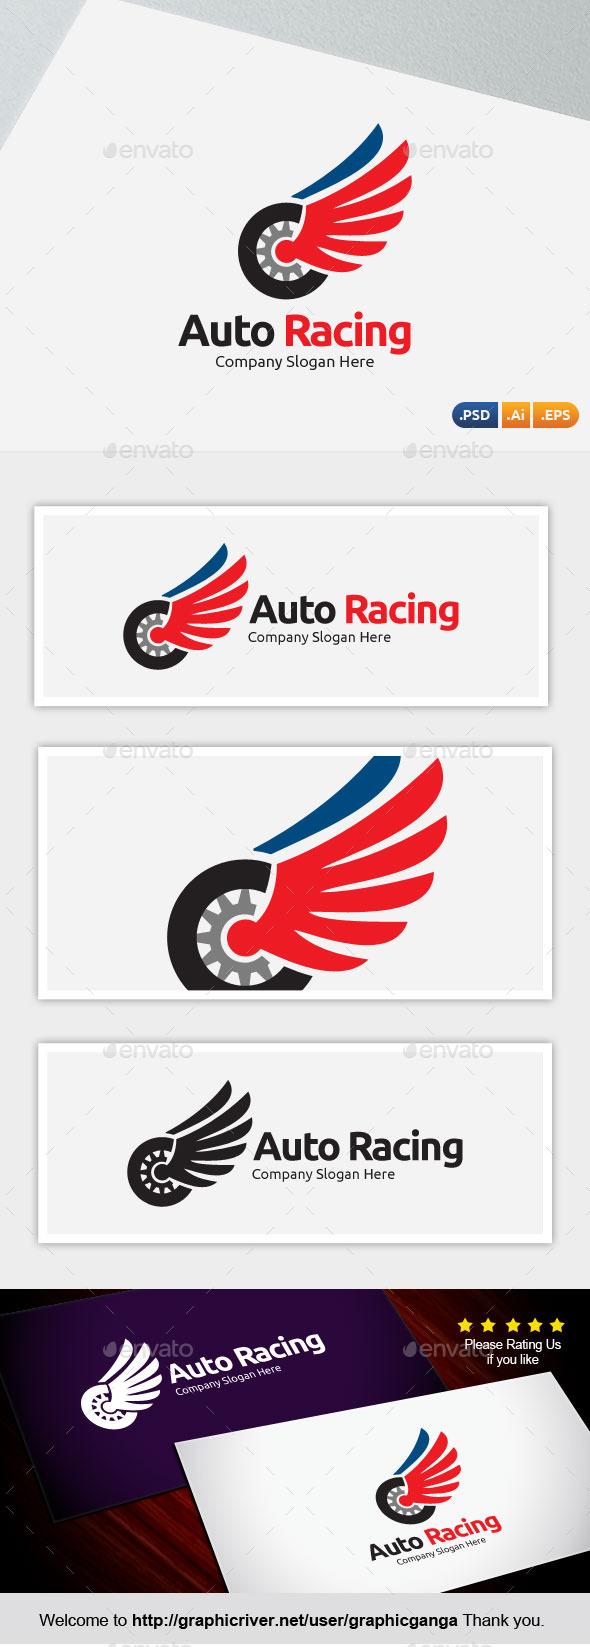 GraphicRiver Auto Racing 10467998